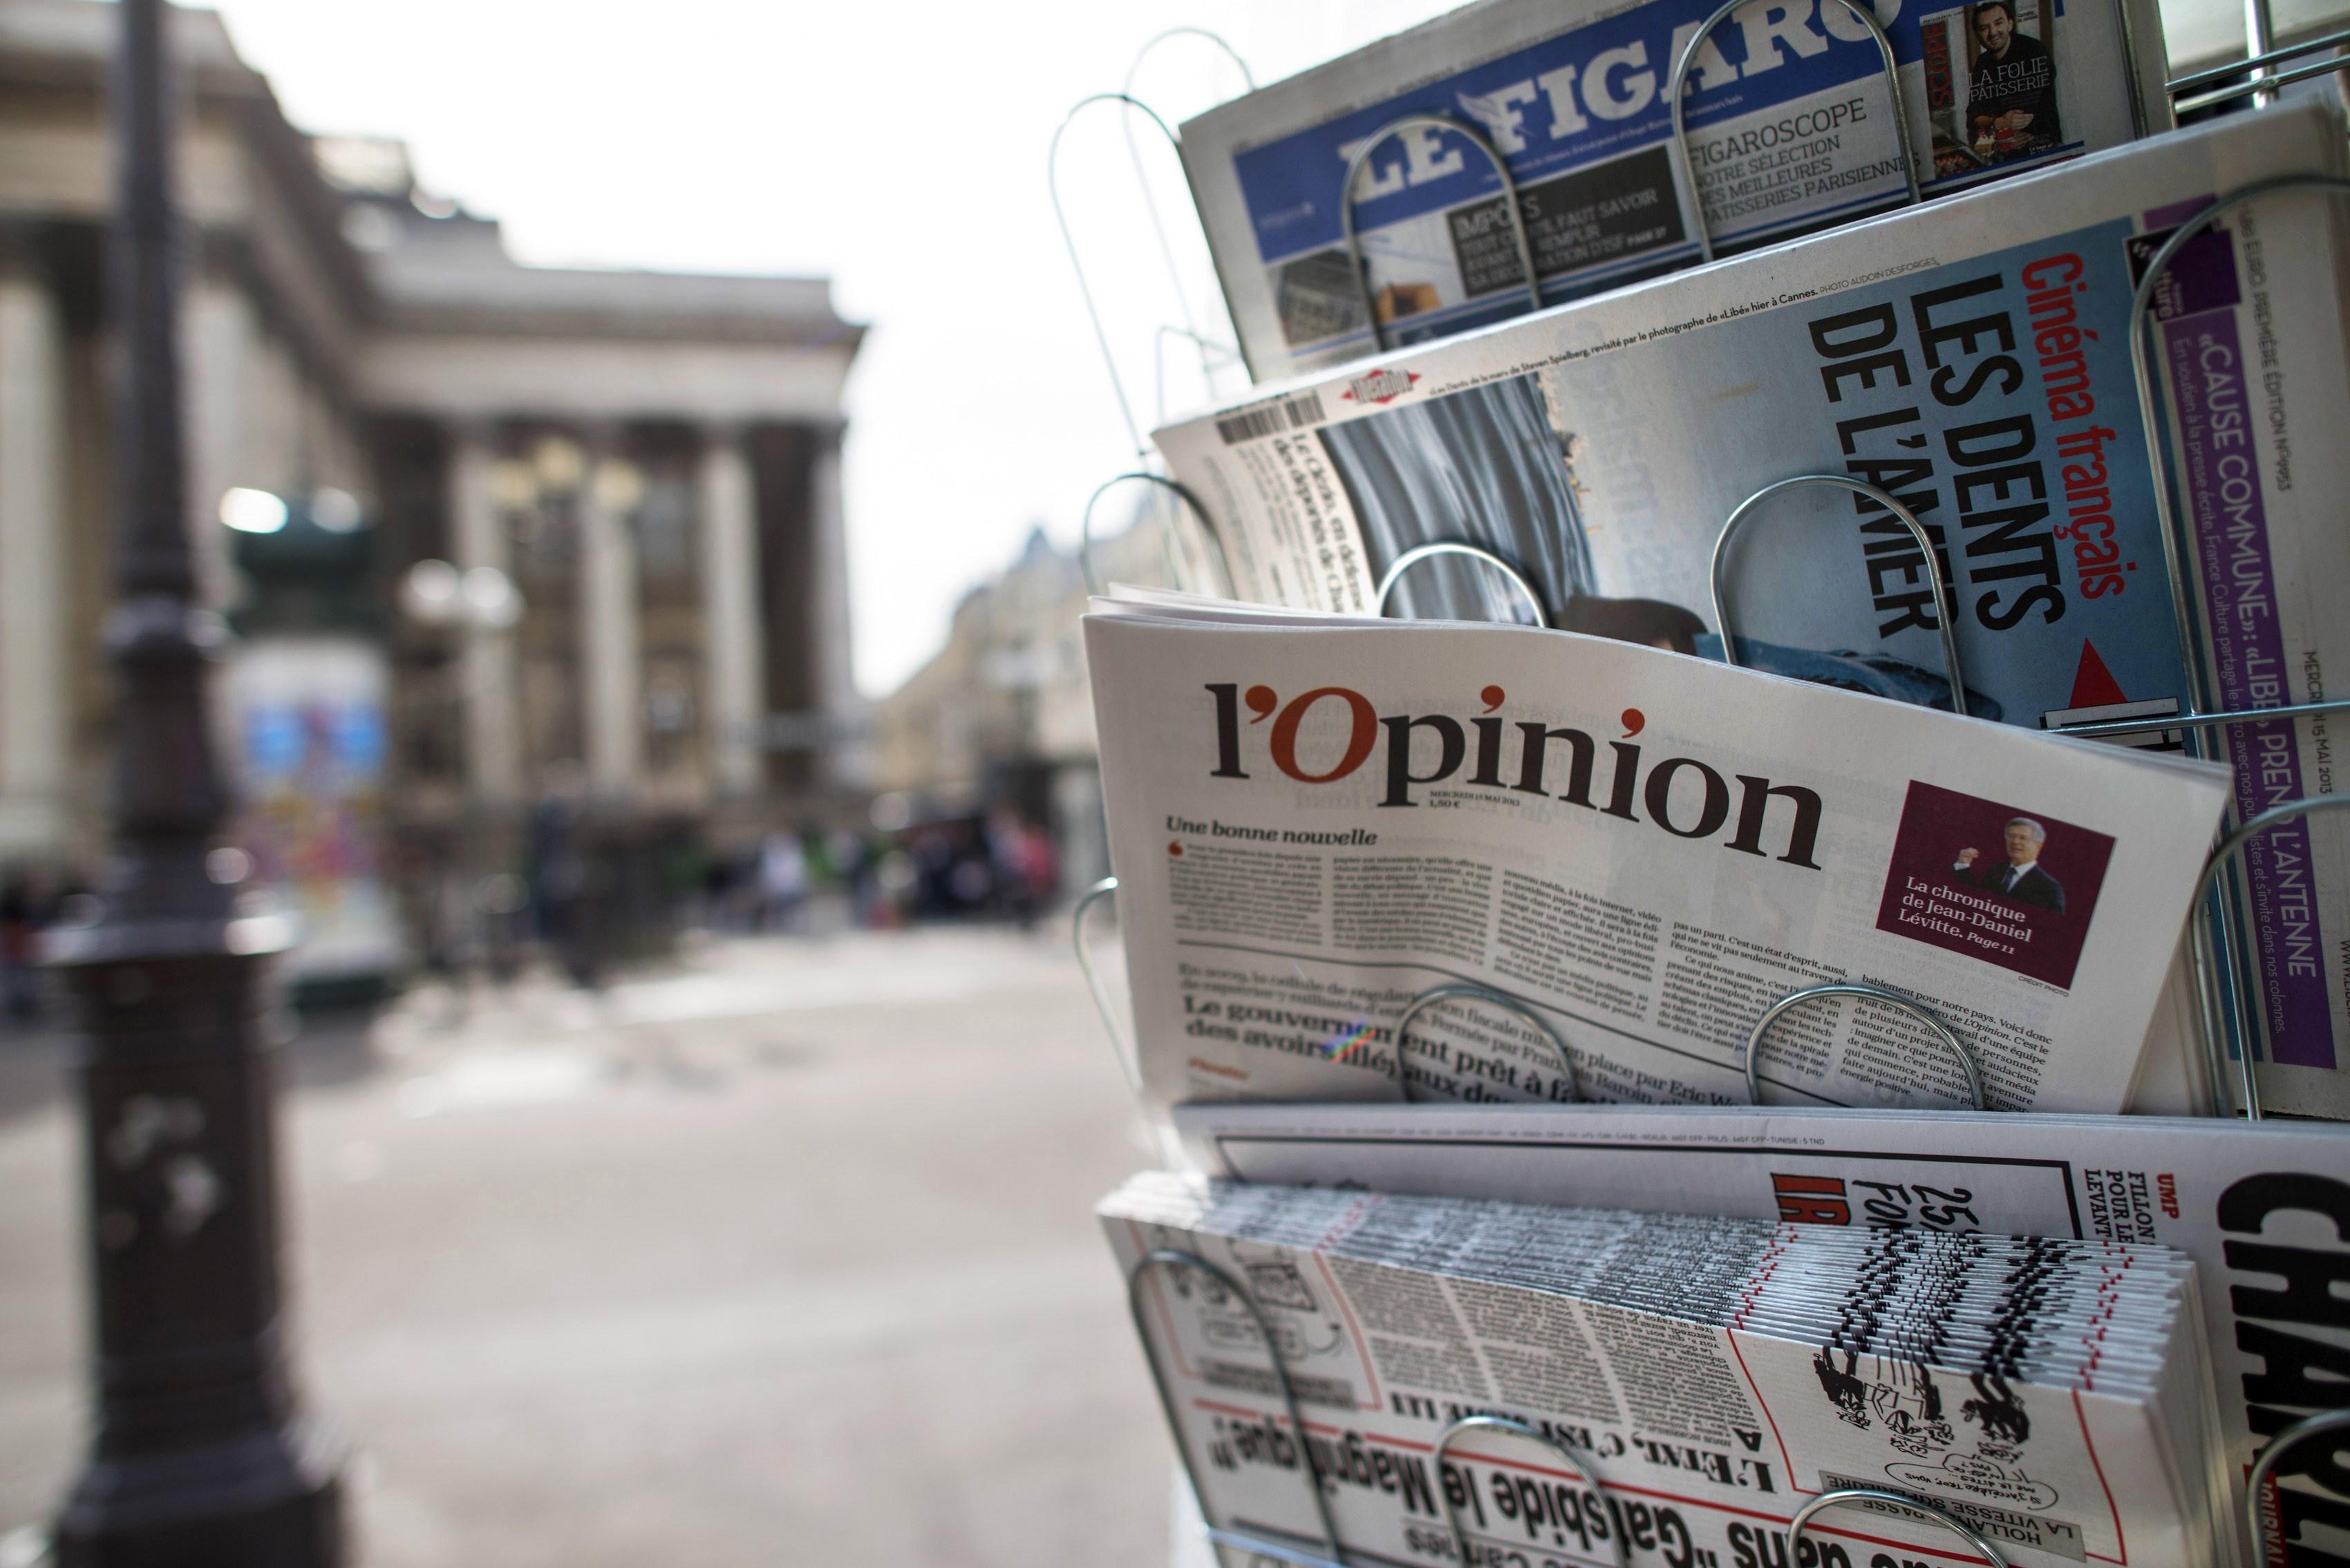 France fined Google $ 590 million in the latest antitrust action